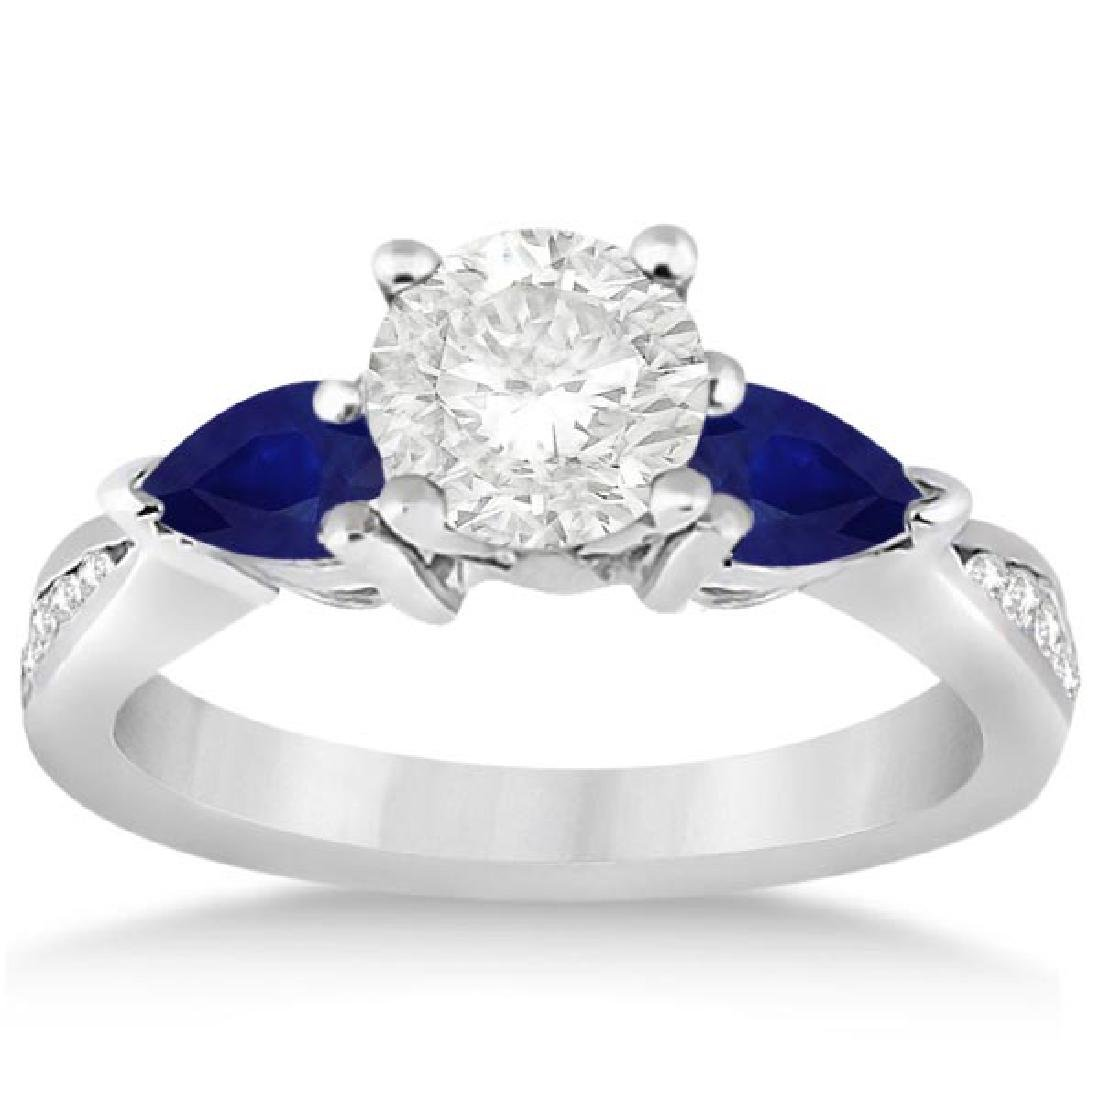 Diamond and Pear Blue Sapphire Engagement Ring Platinum